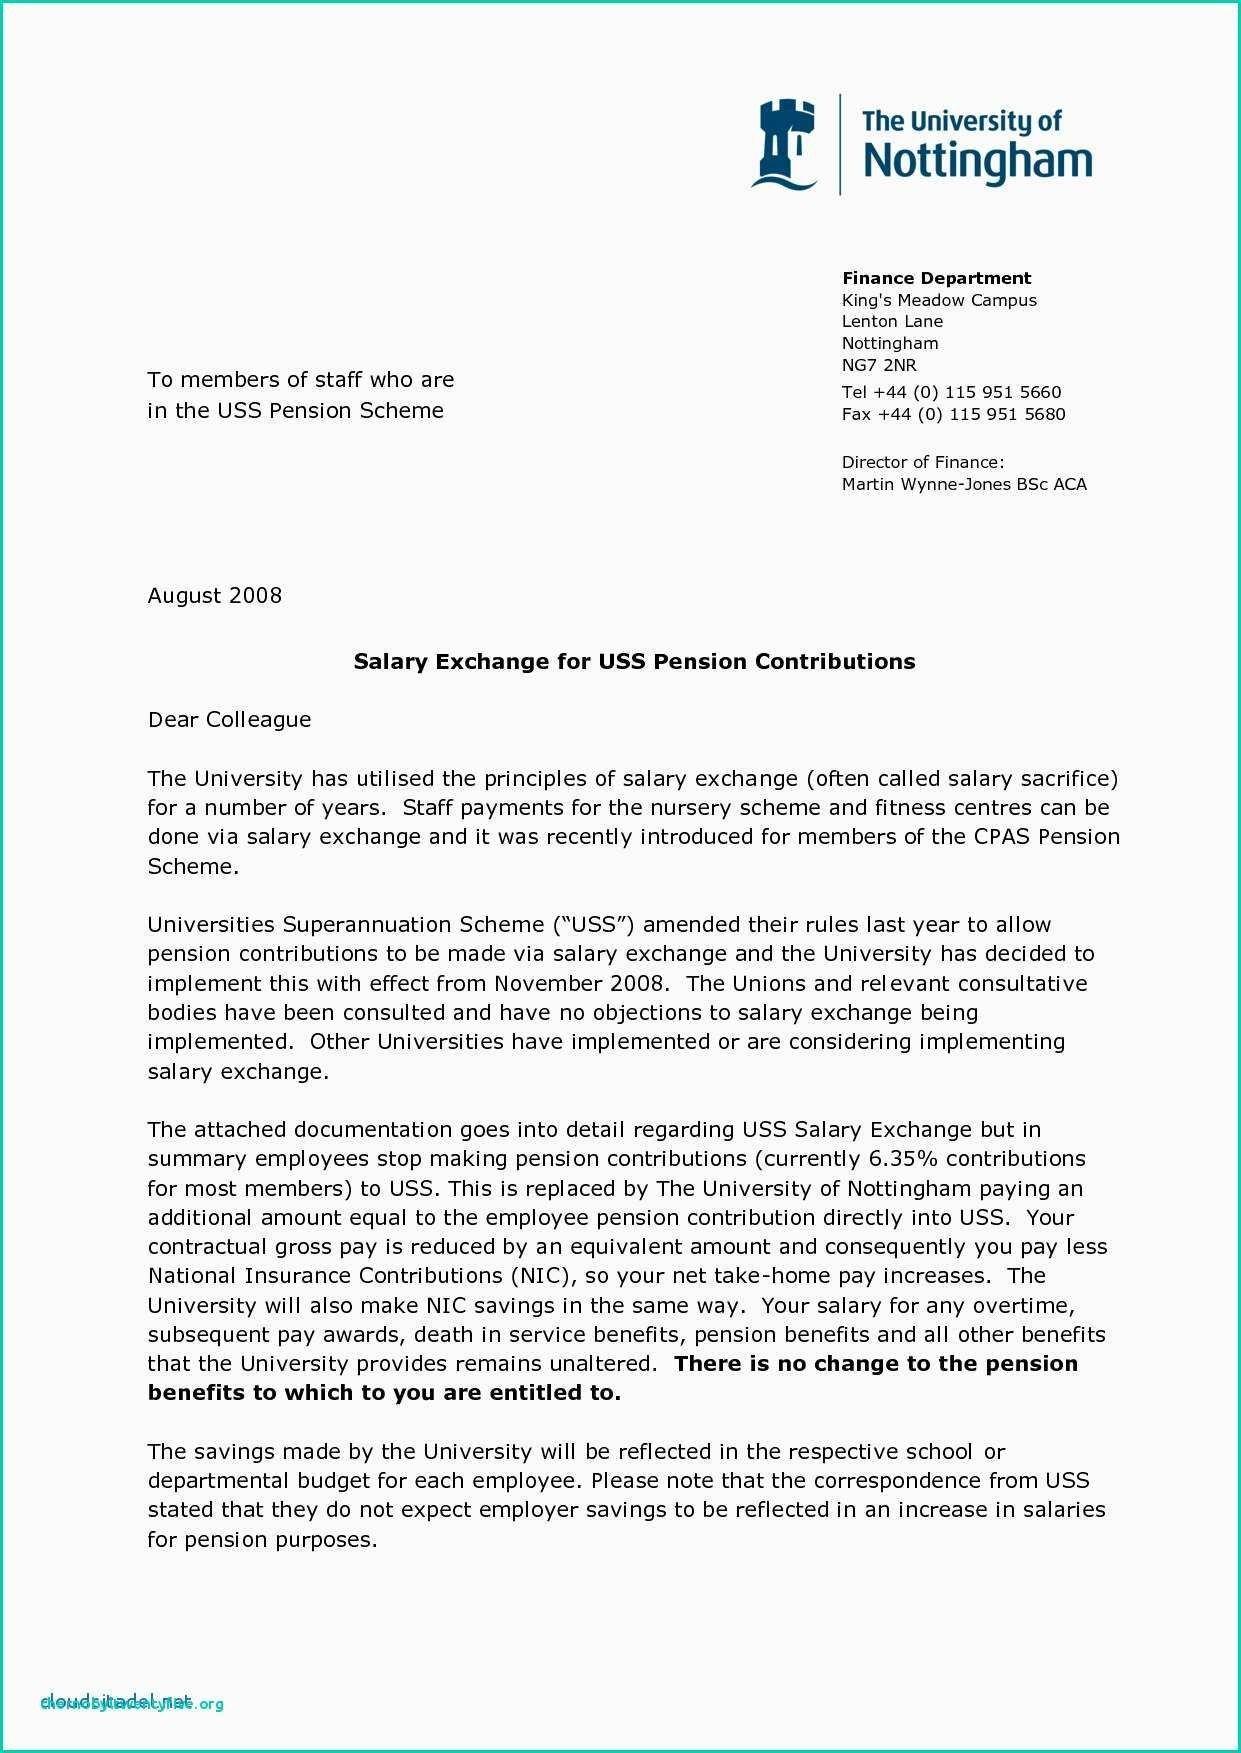 Fresh Letterhead Text Sample Pdf Business letter template